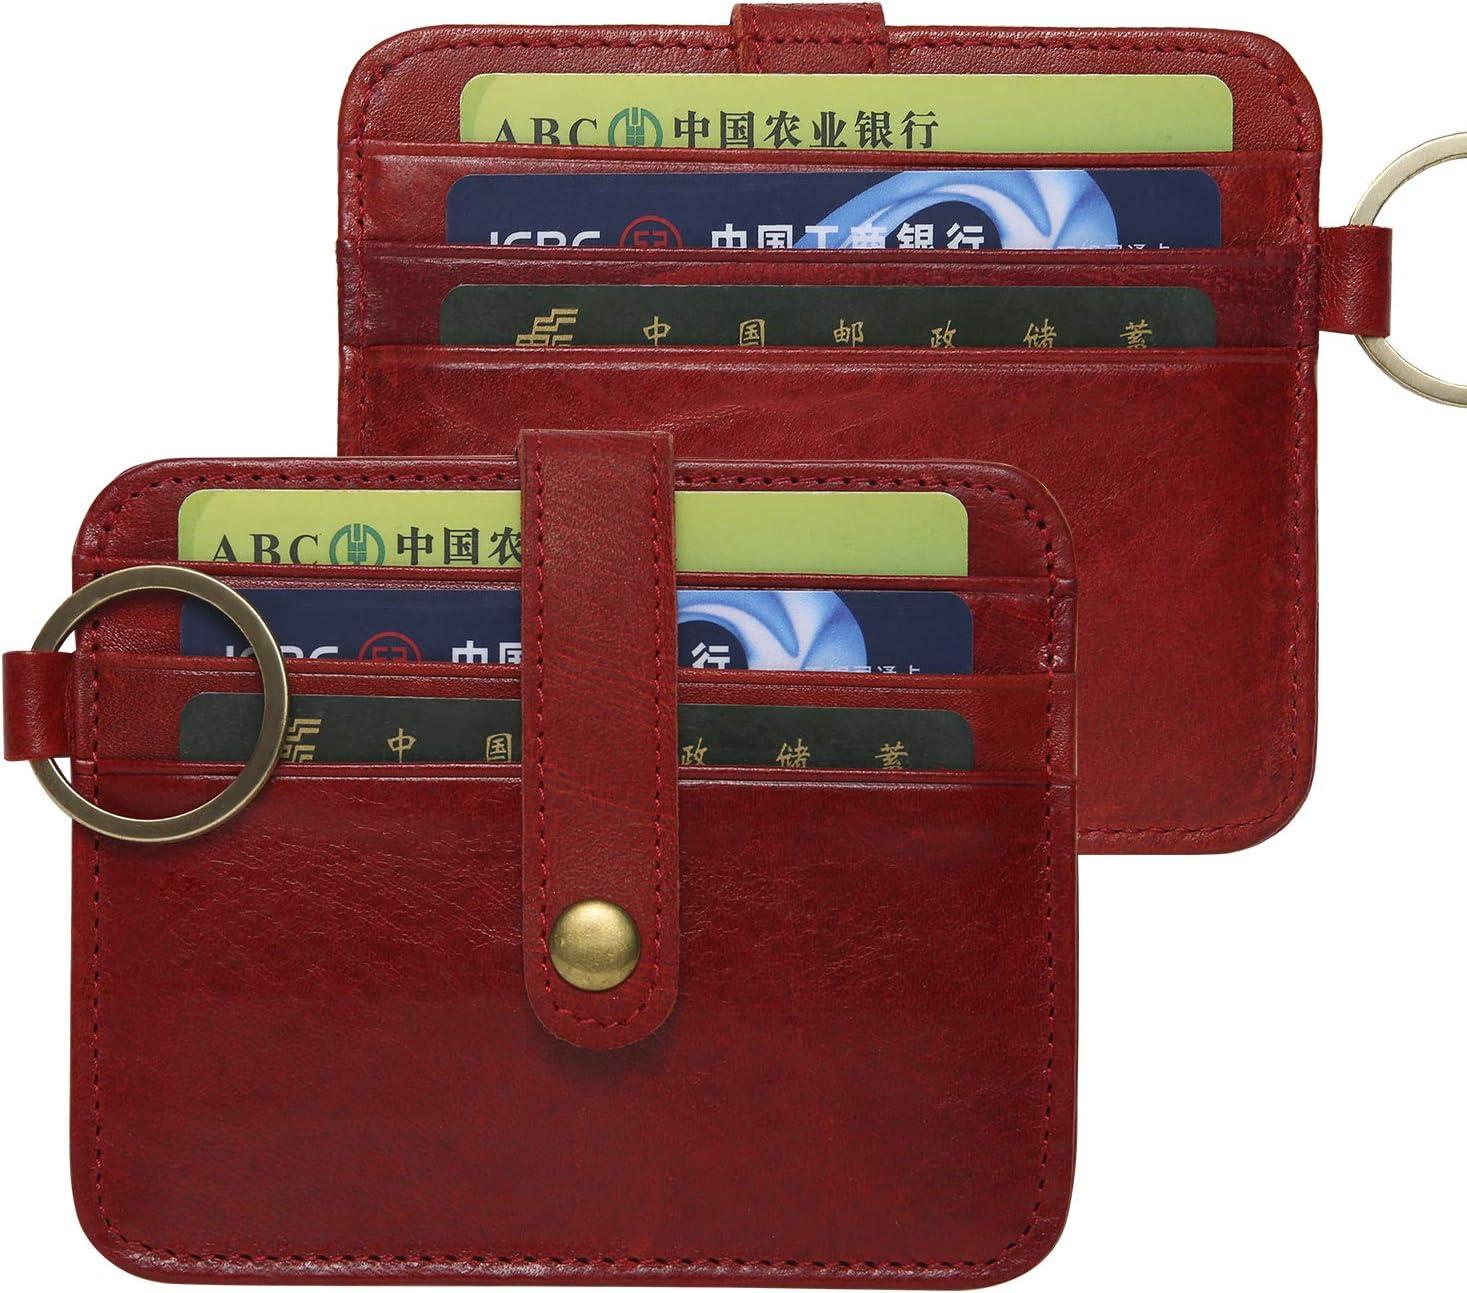 Minimalist Leather RFID Blocking Credit Card Holder Front Pocket Slim Wallet Keychain for Men & Women